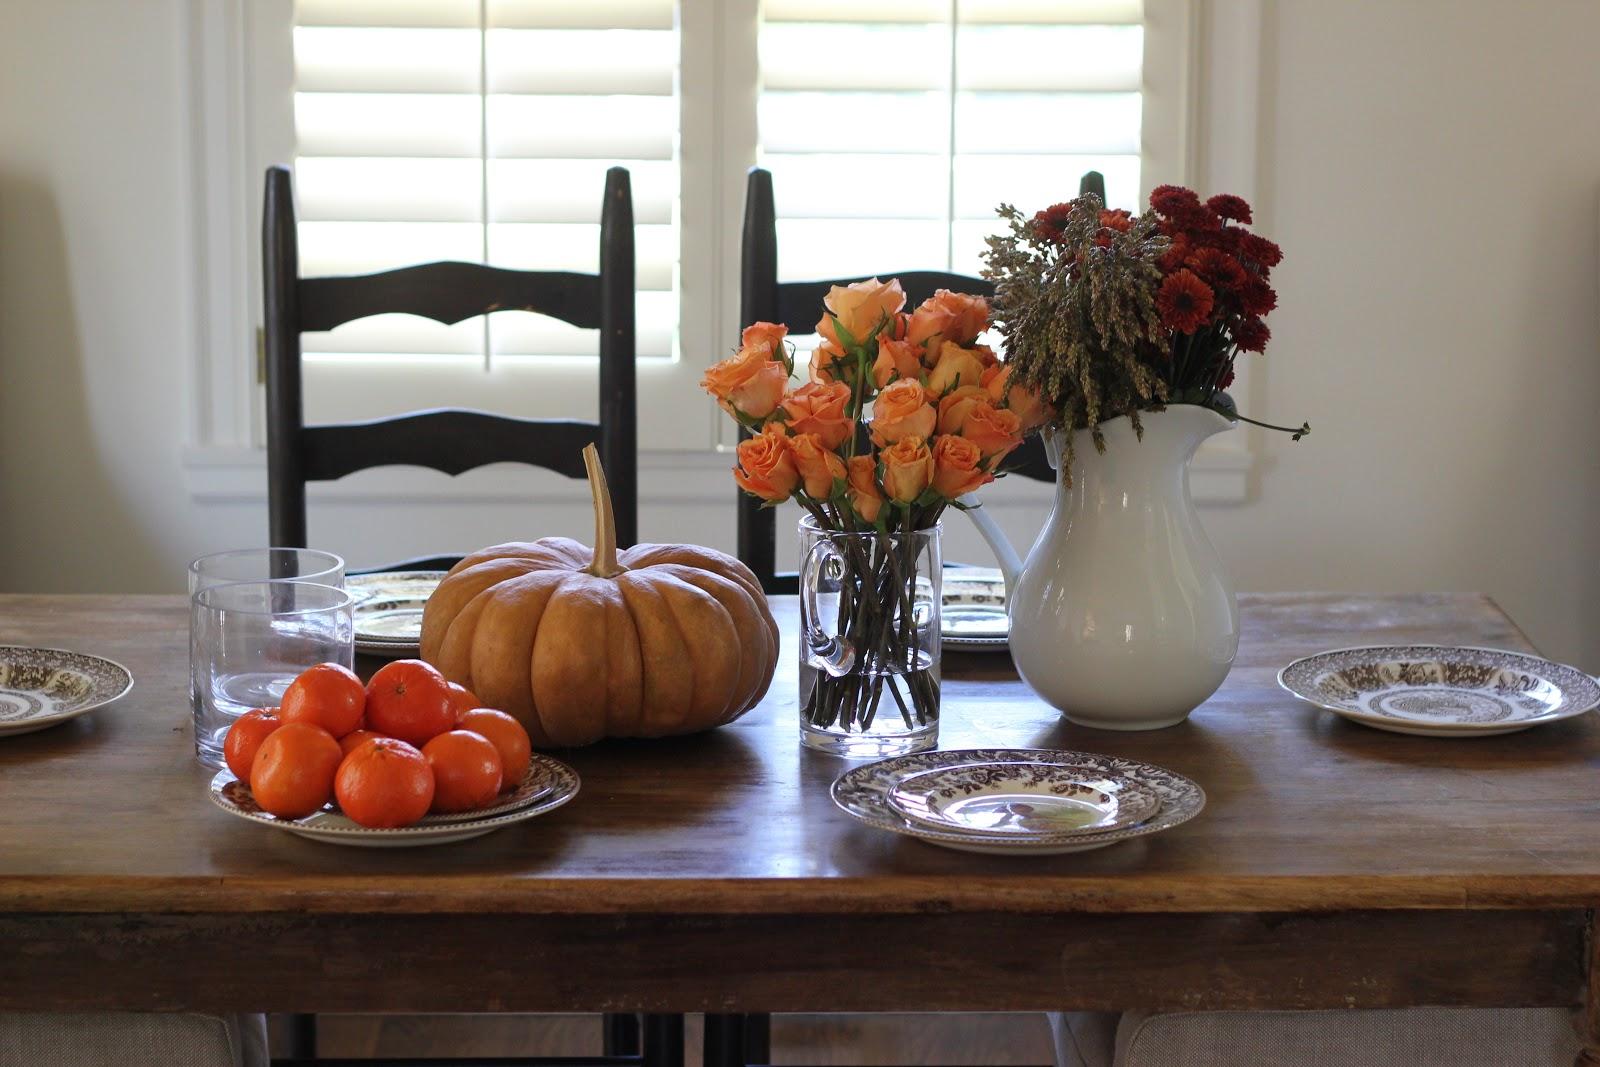 Jenny steffens hobick diy thanksgiving centerpiece